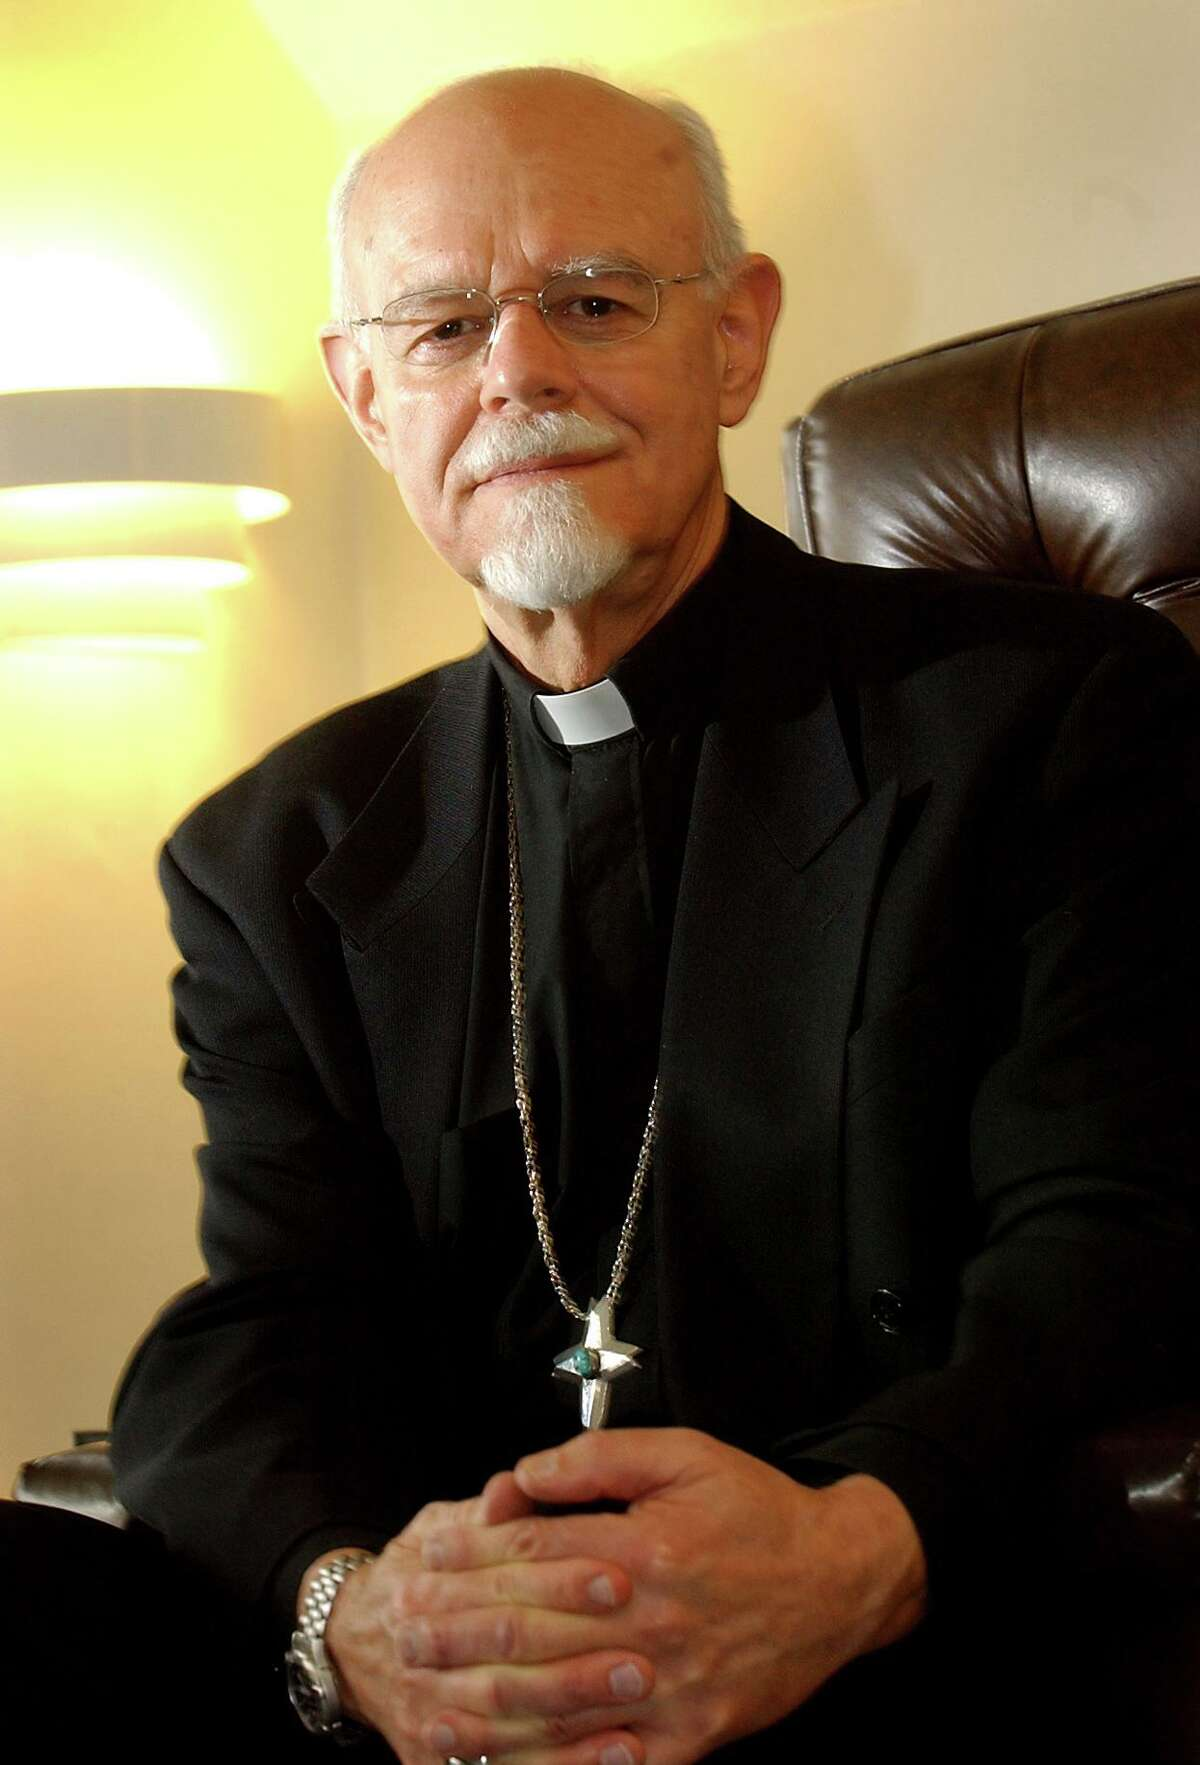 Bishop Peter Rosazza